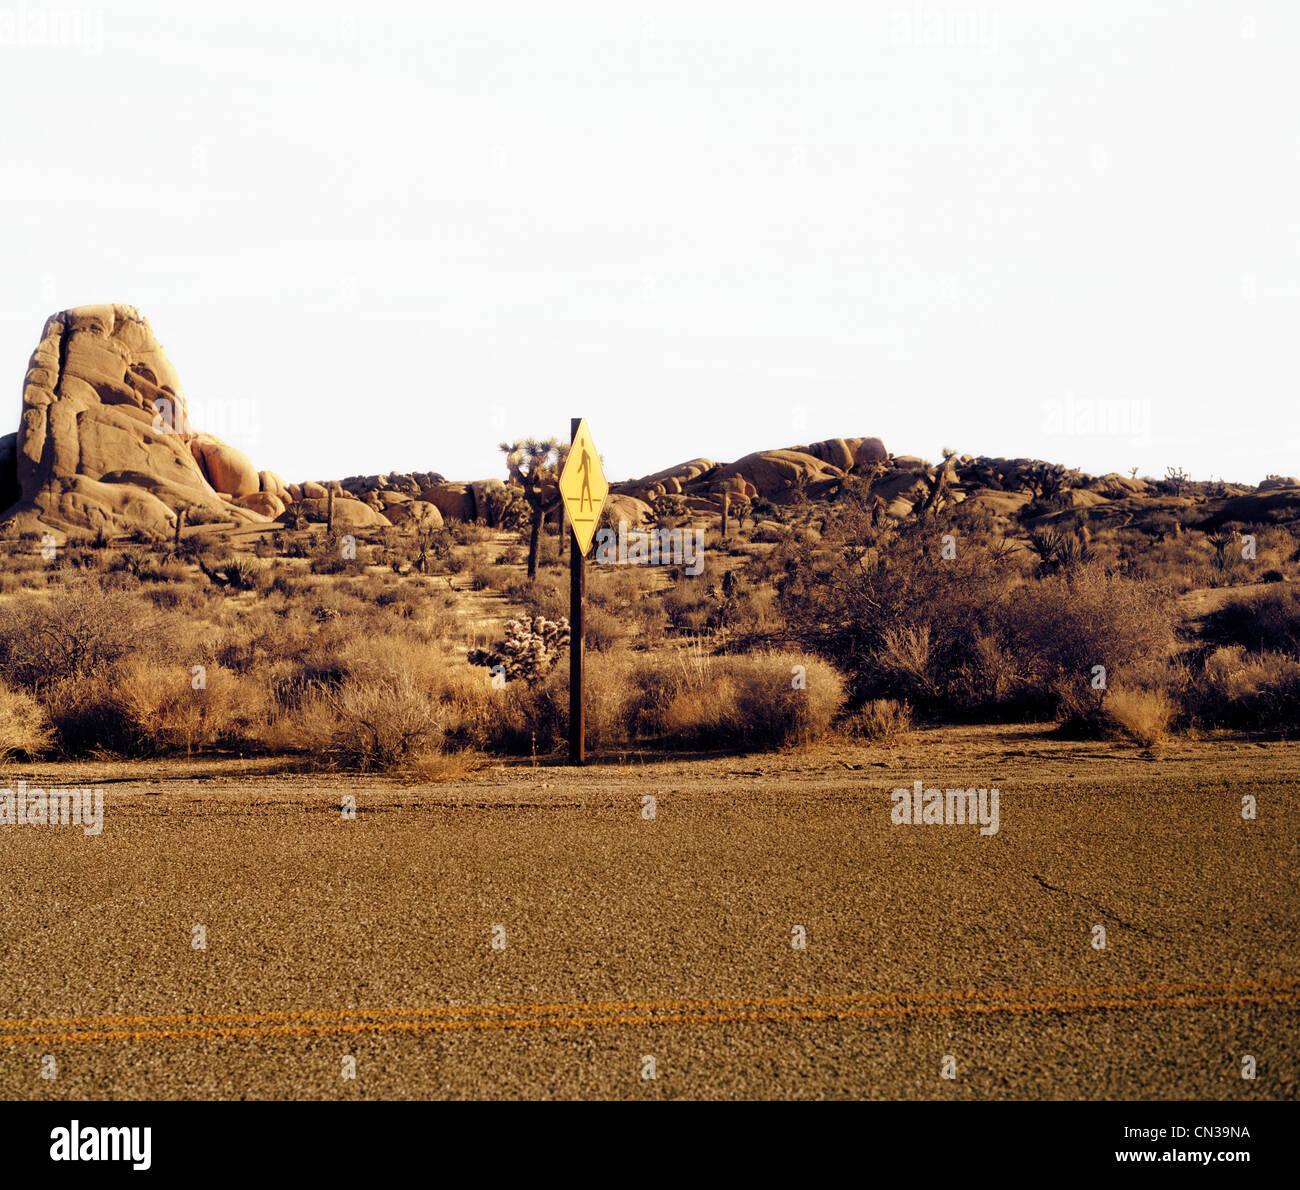 Road and road sign, Joshua Tree, California, USA - Stock Image